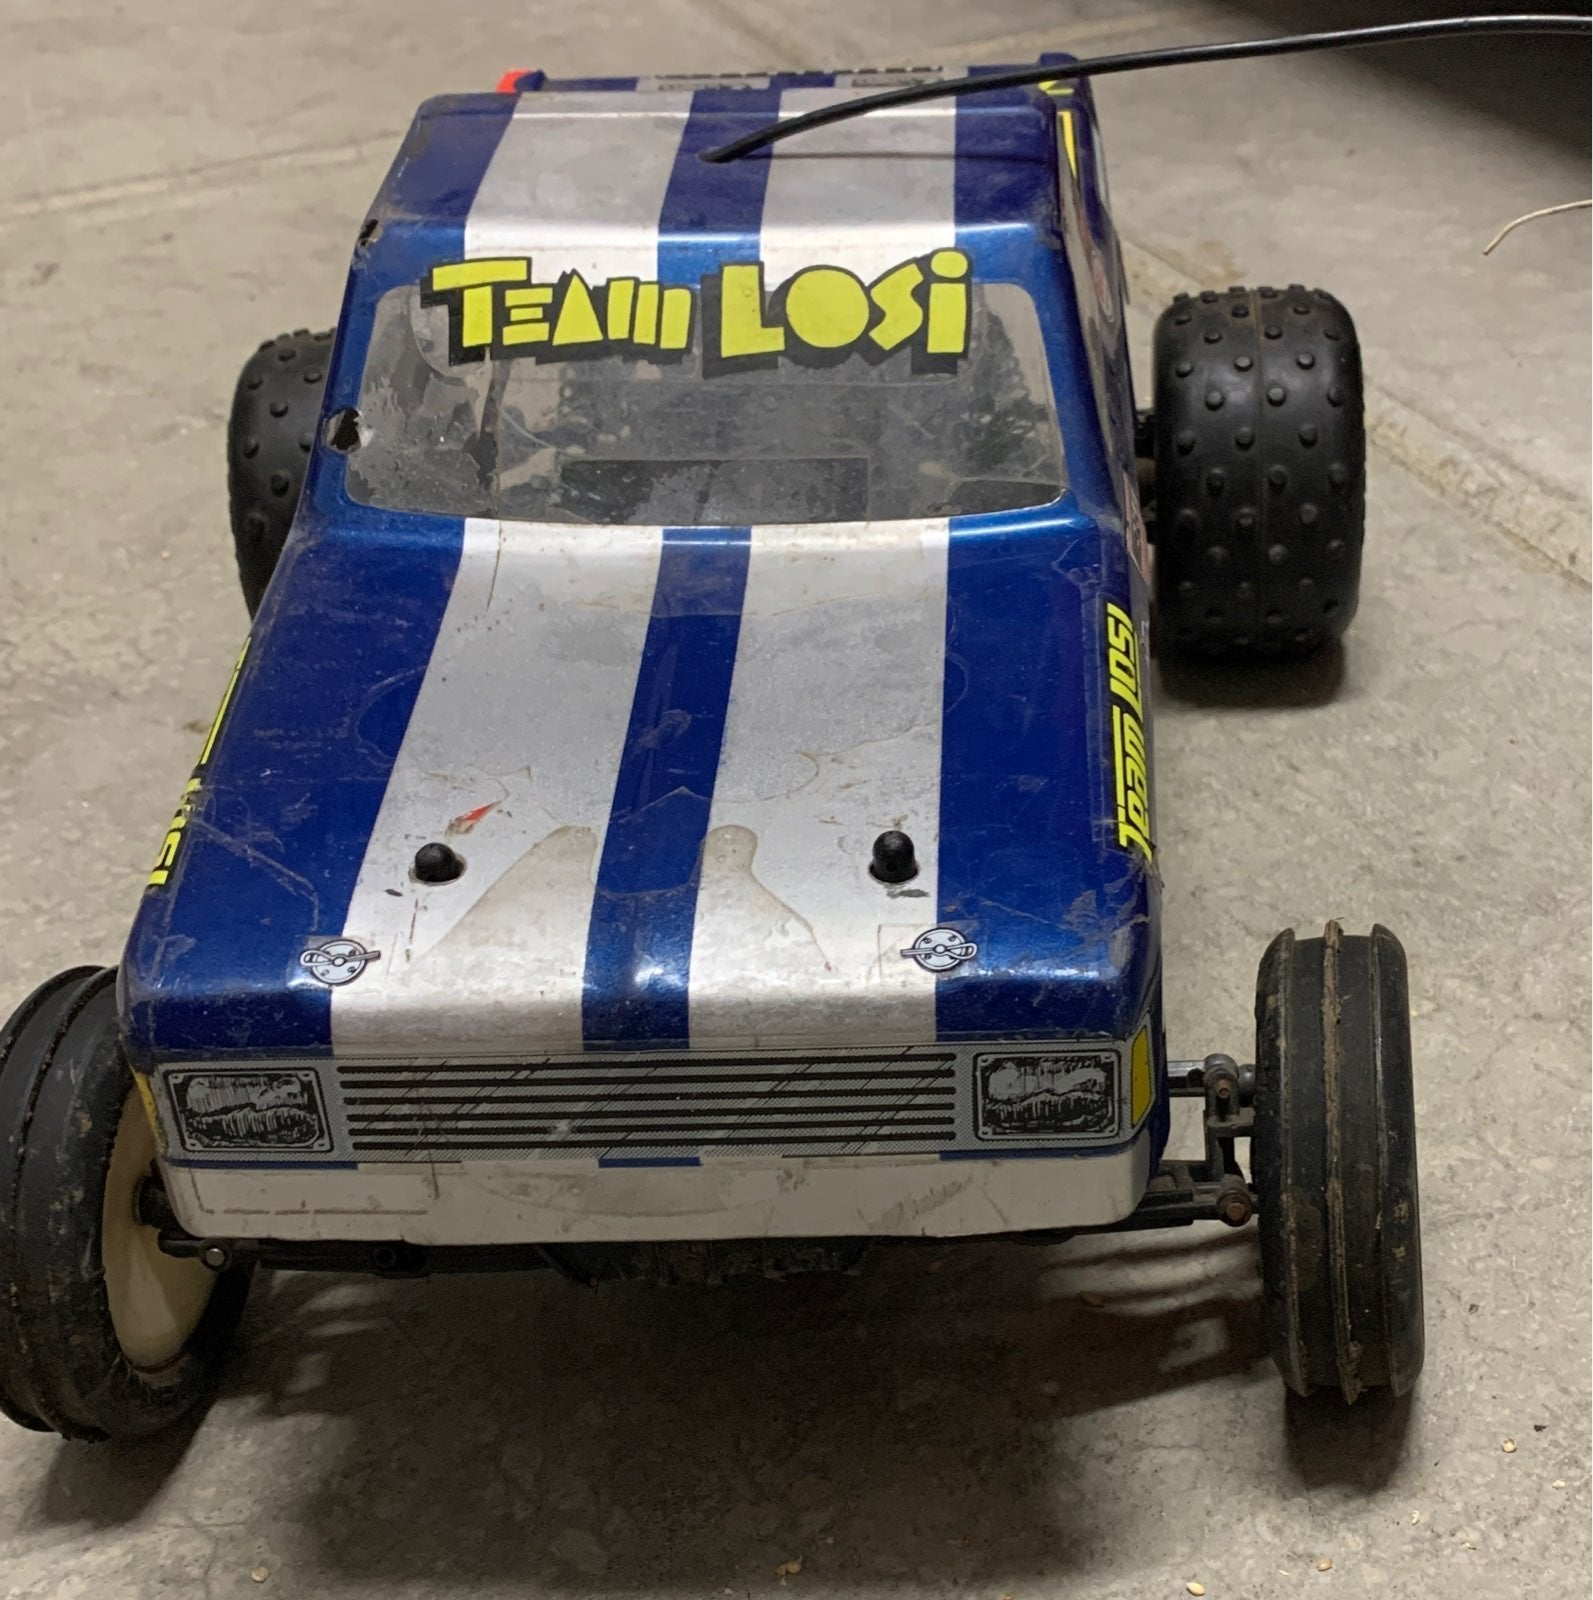 Team losi JRT rc truck rc car vintage